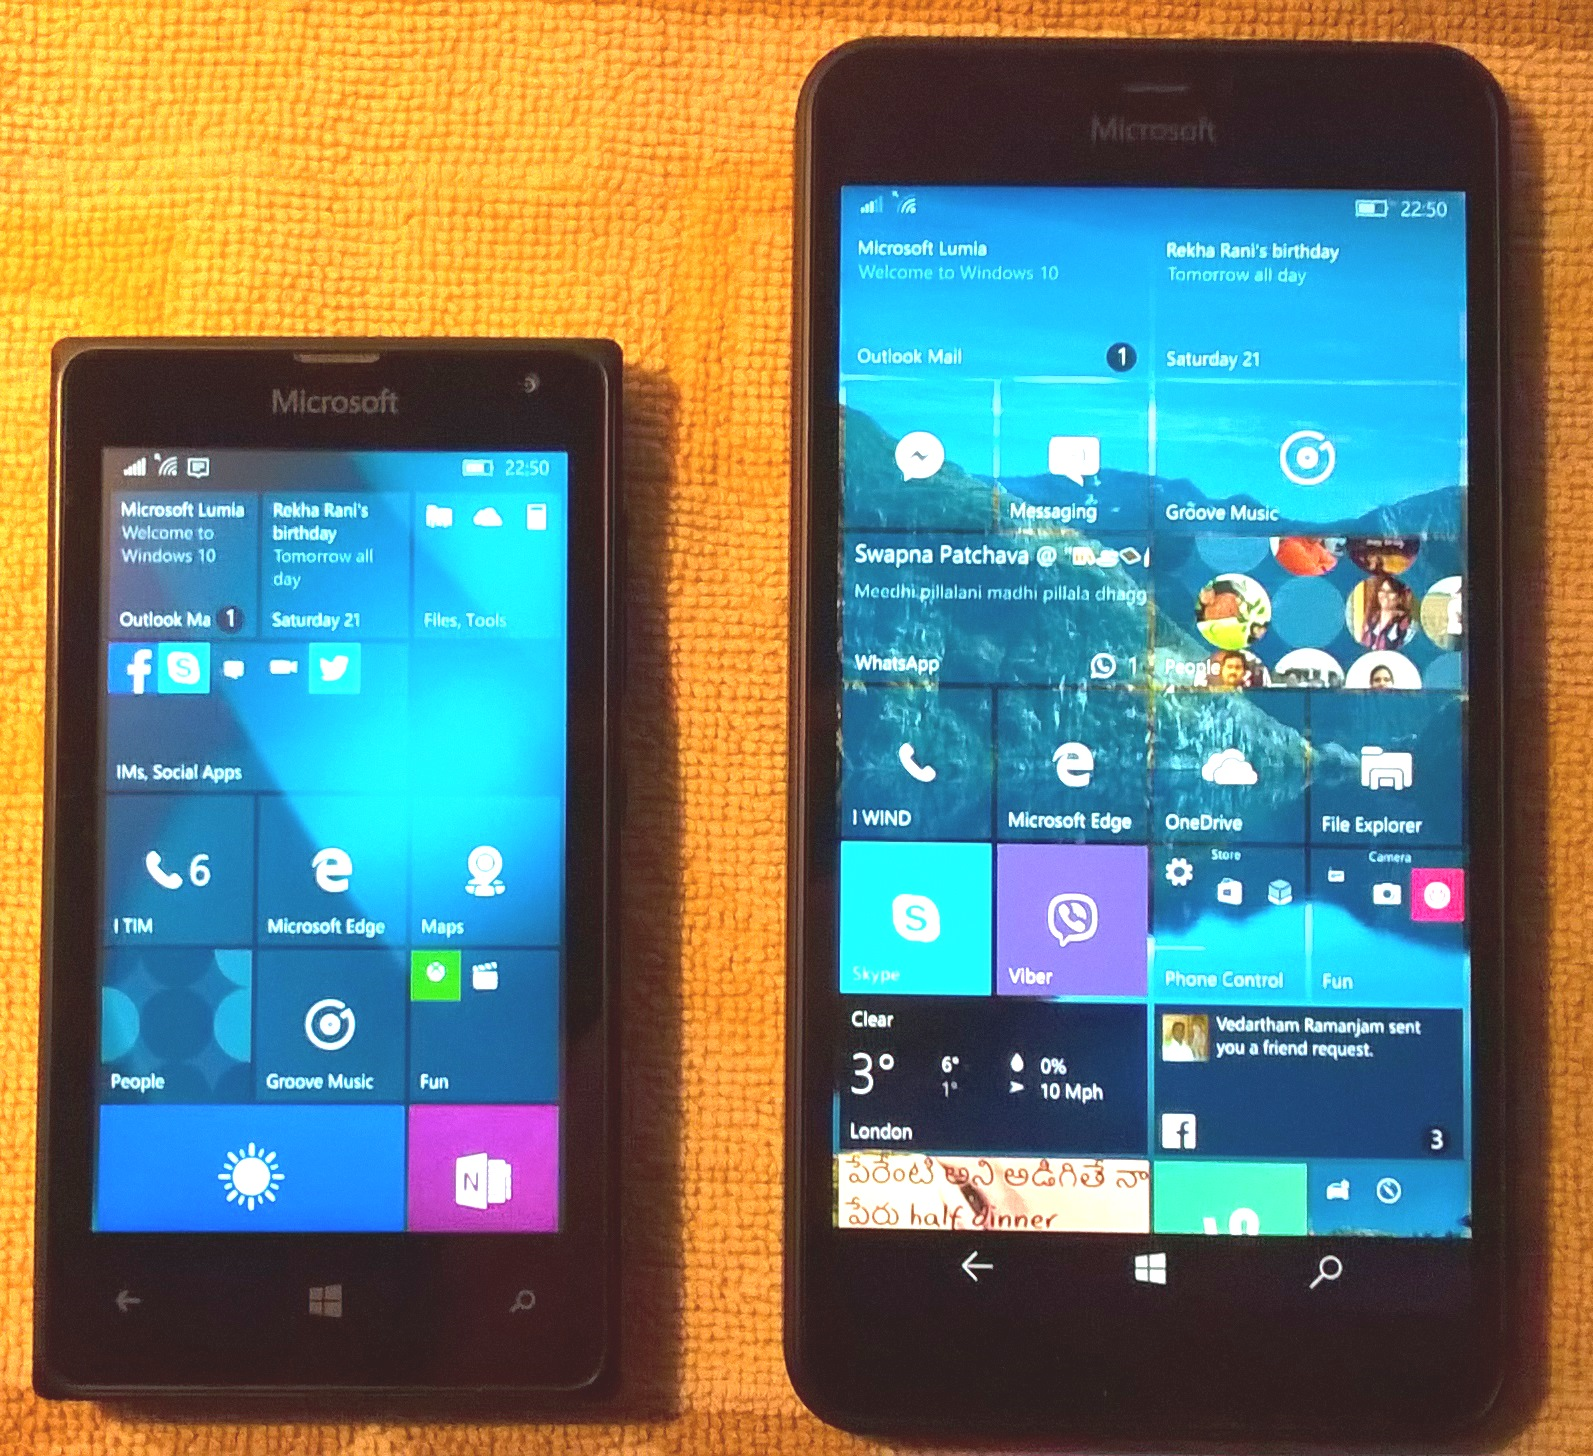 microsoft recovery tool windows phone 8.1